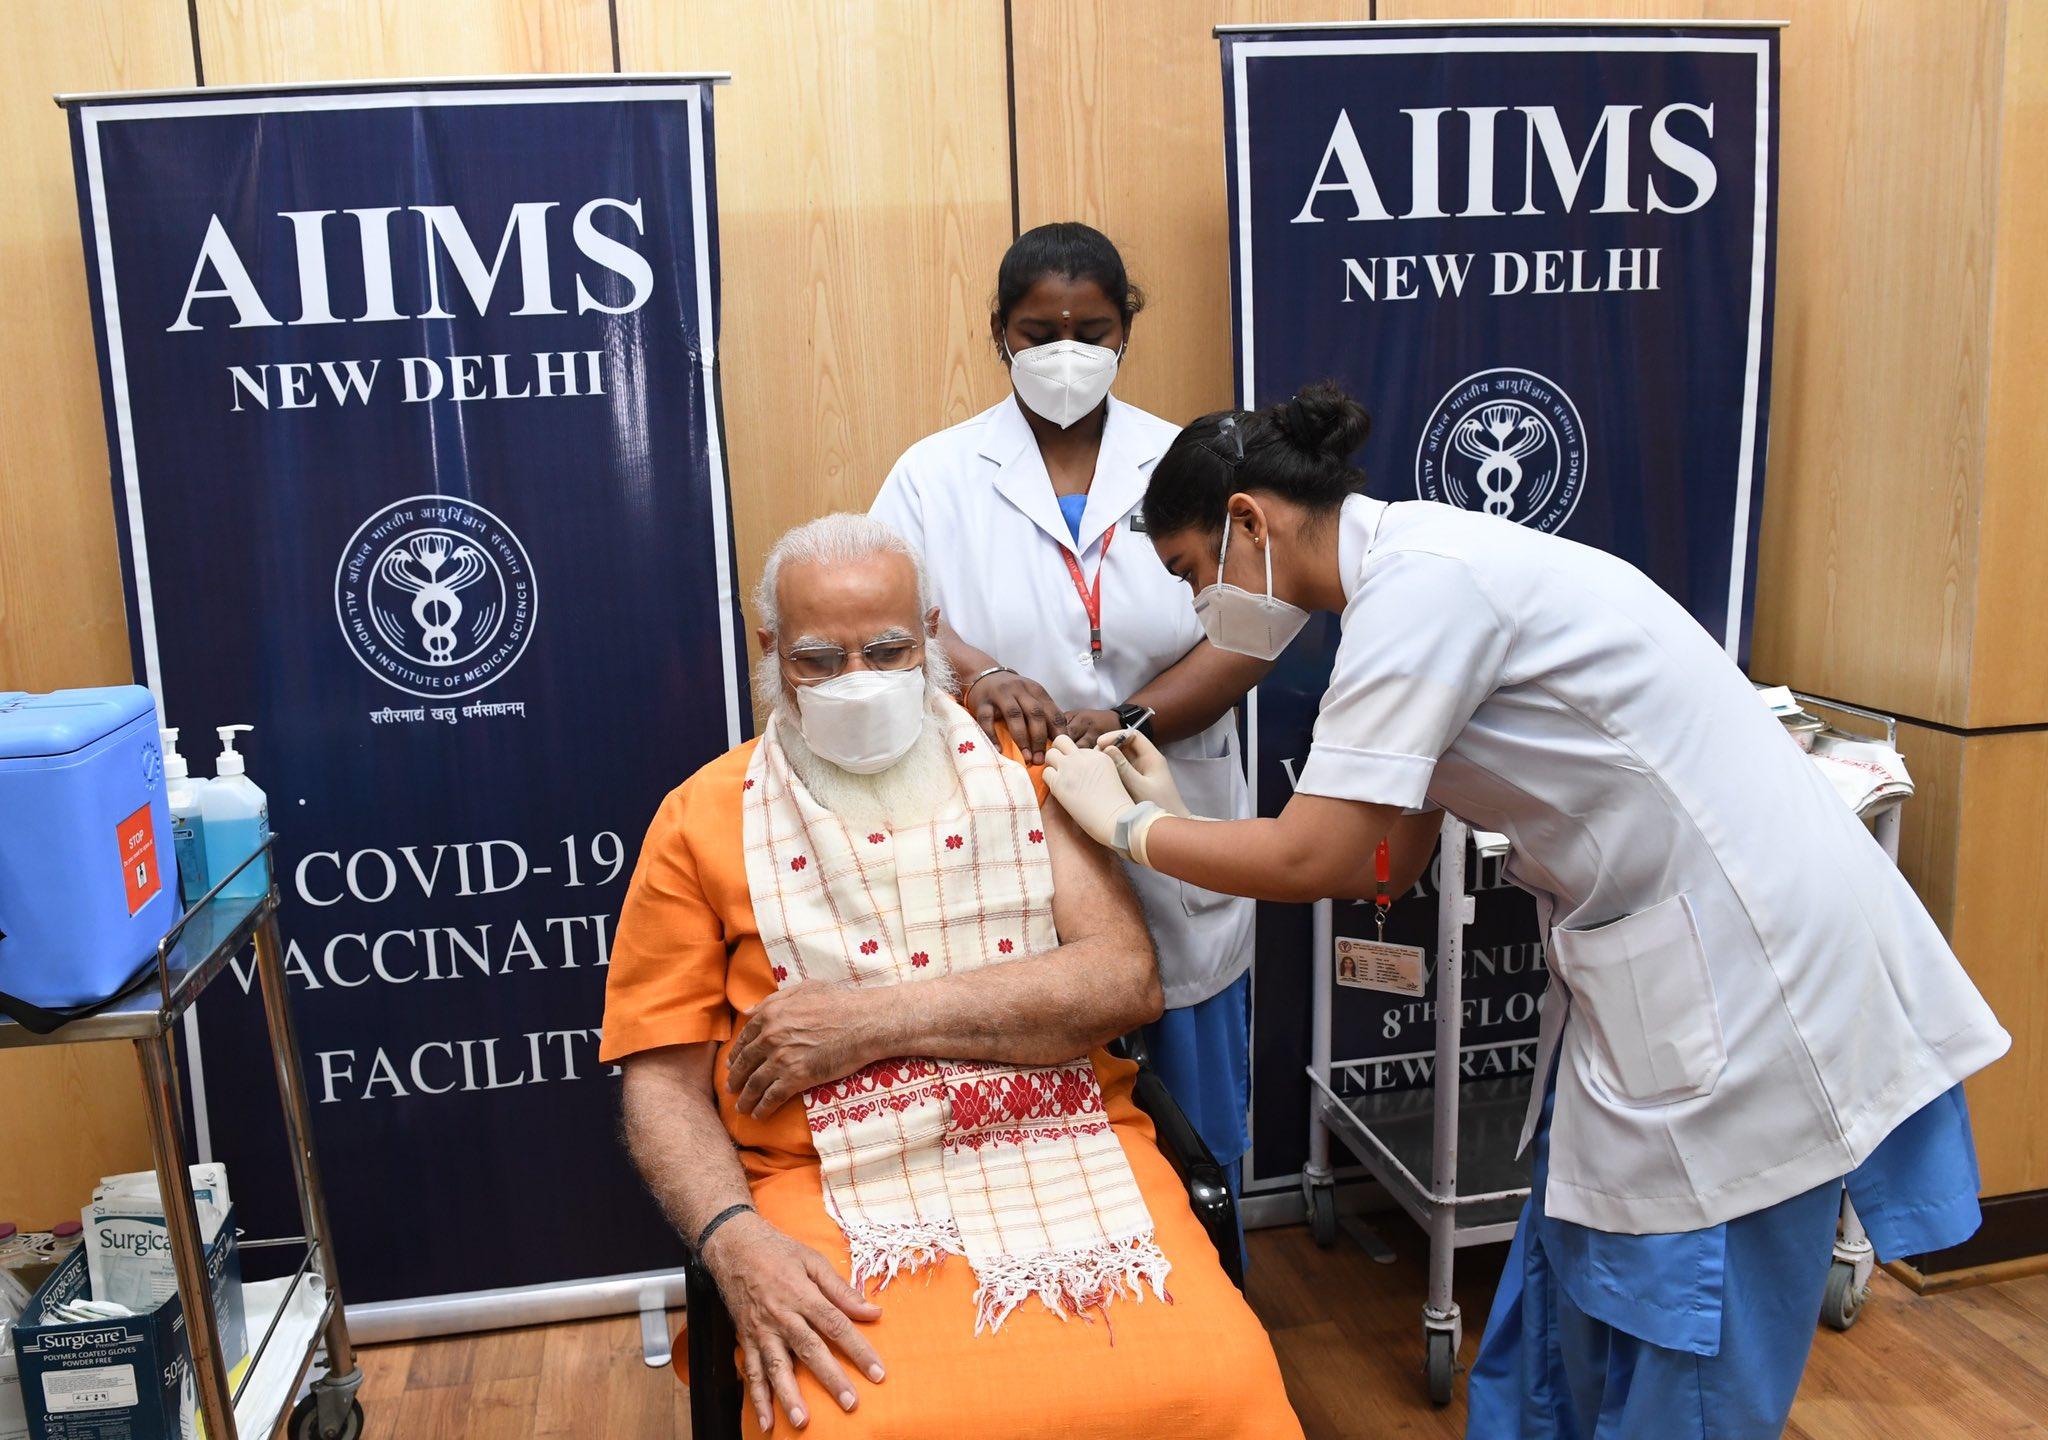 AIIMS पहुंचकर पीएम मोदी ने लगवाई कोरोना वैक्सीन की सेकेंड डोज